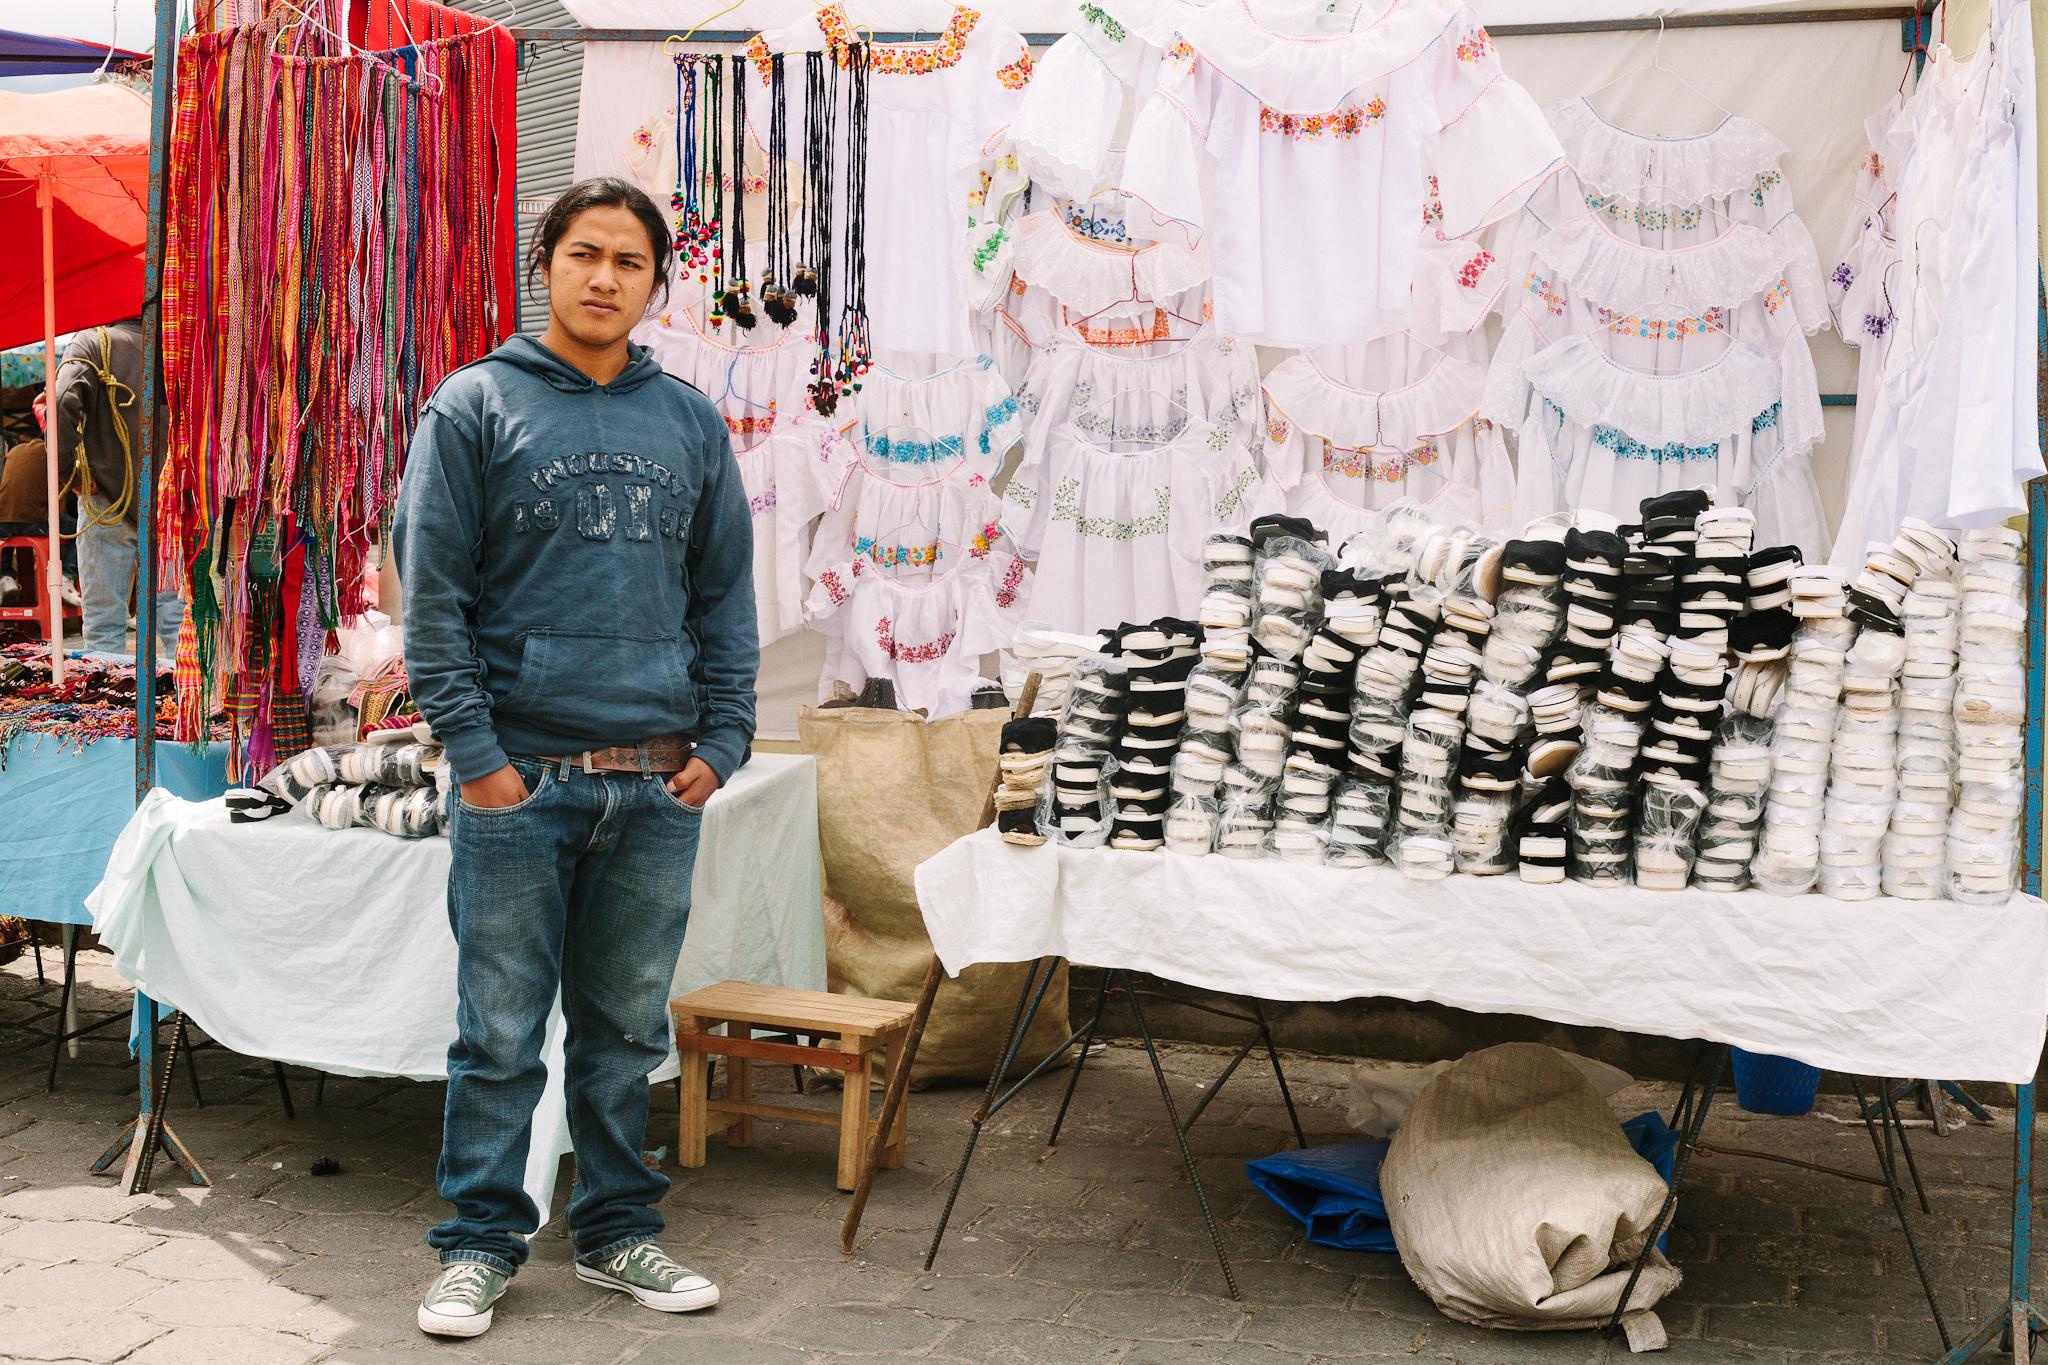 Ecuador2011_Mountains&Sea_Web_jenniferleahy-050.jpg